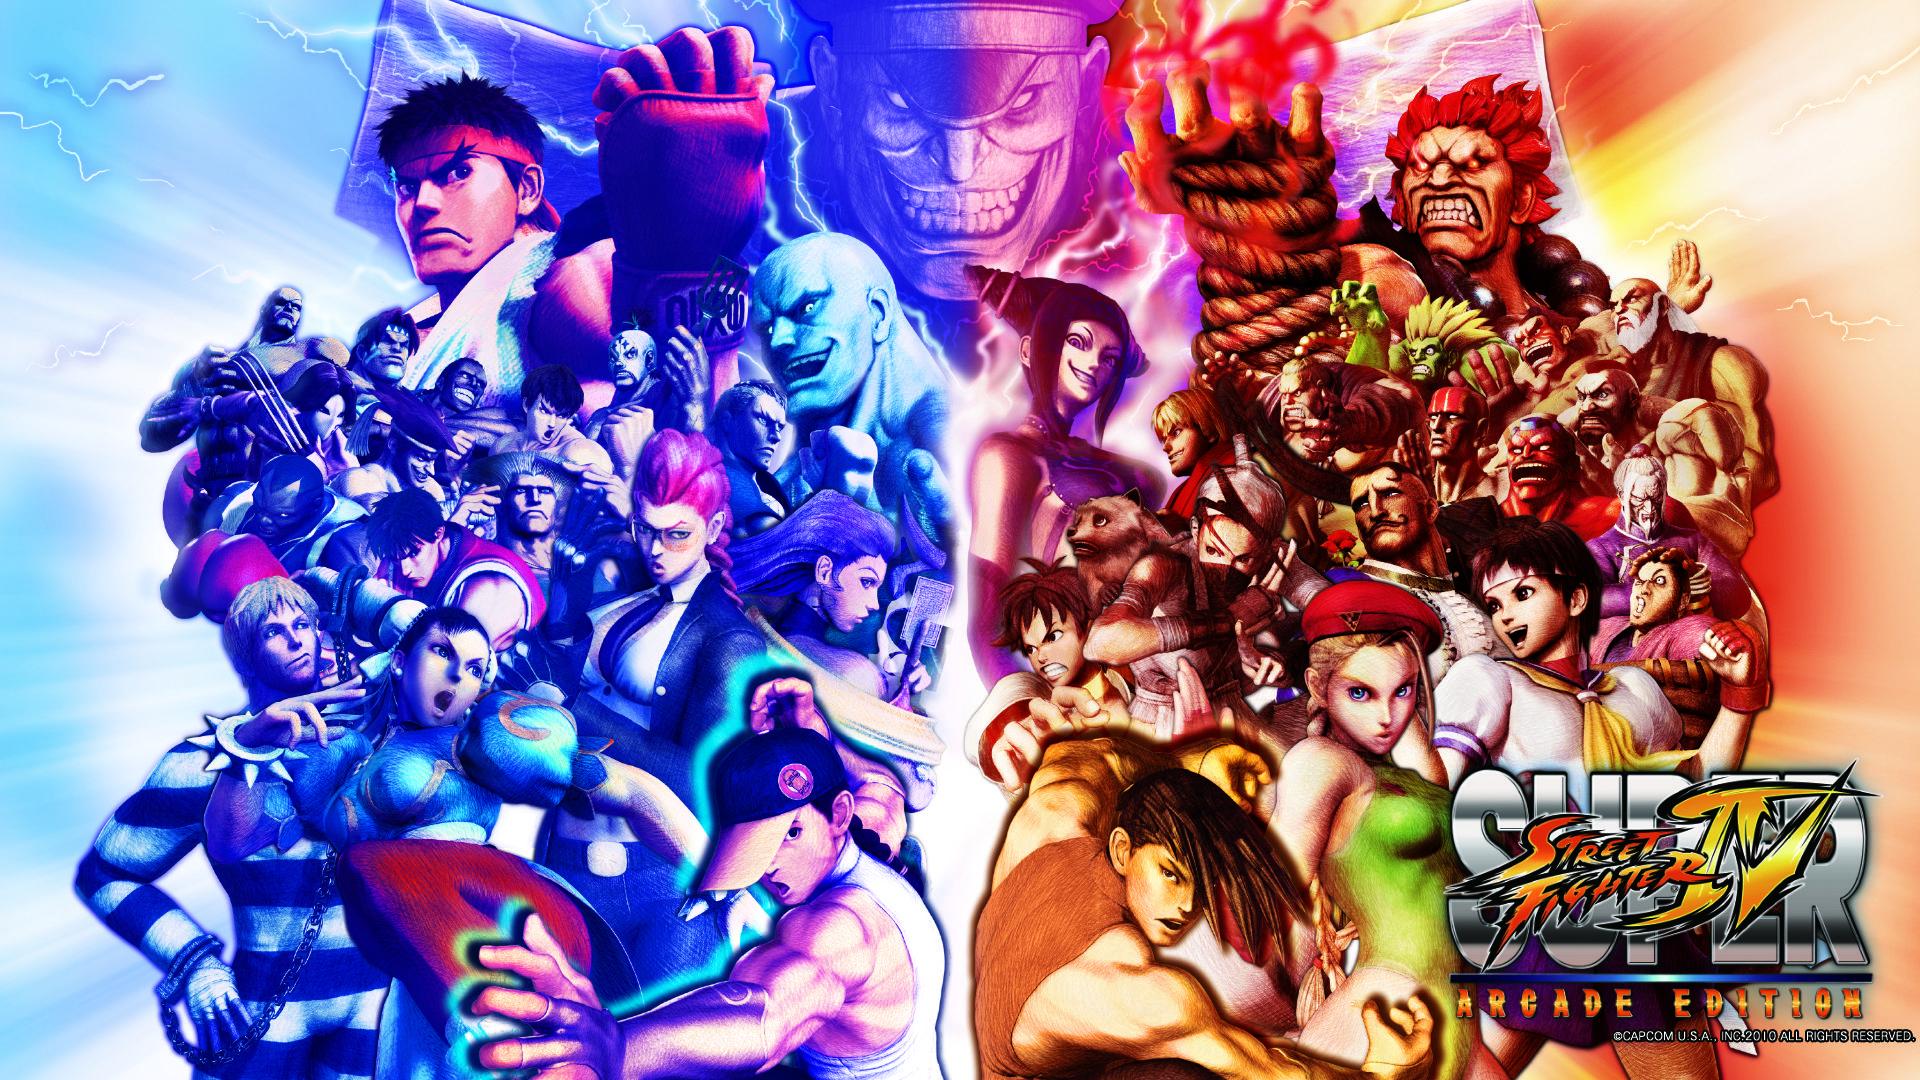 Street Fighter 5 Wallpaper: Super Street Fighter IV Arcade Edition: Wallpapers